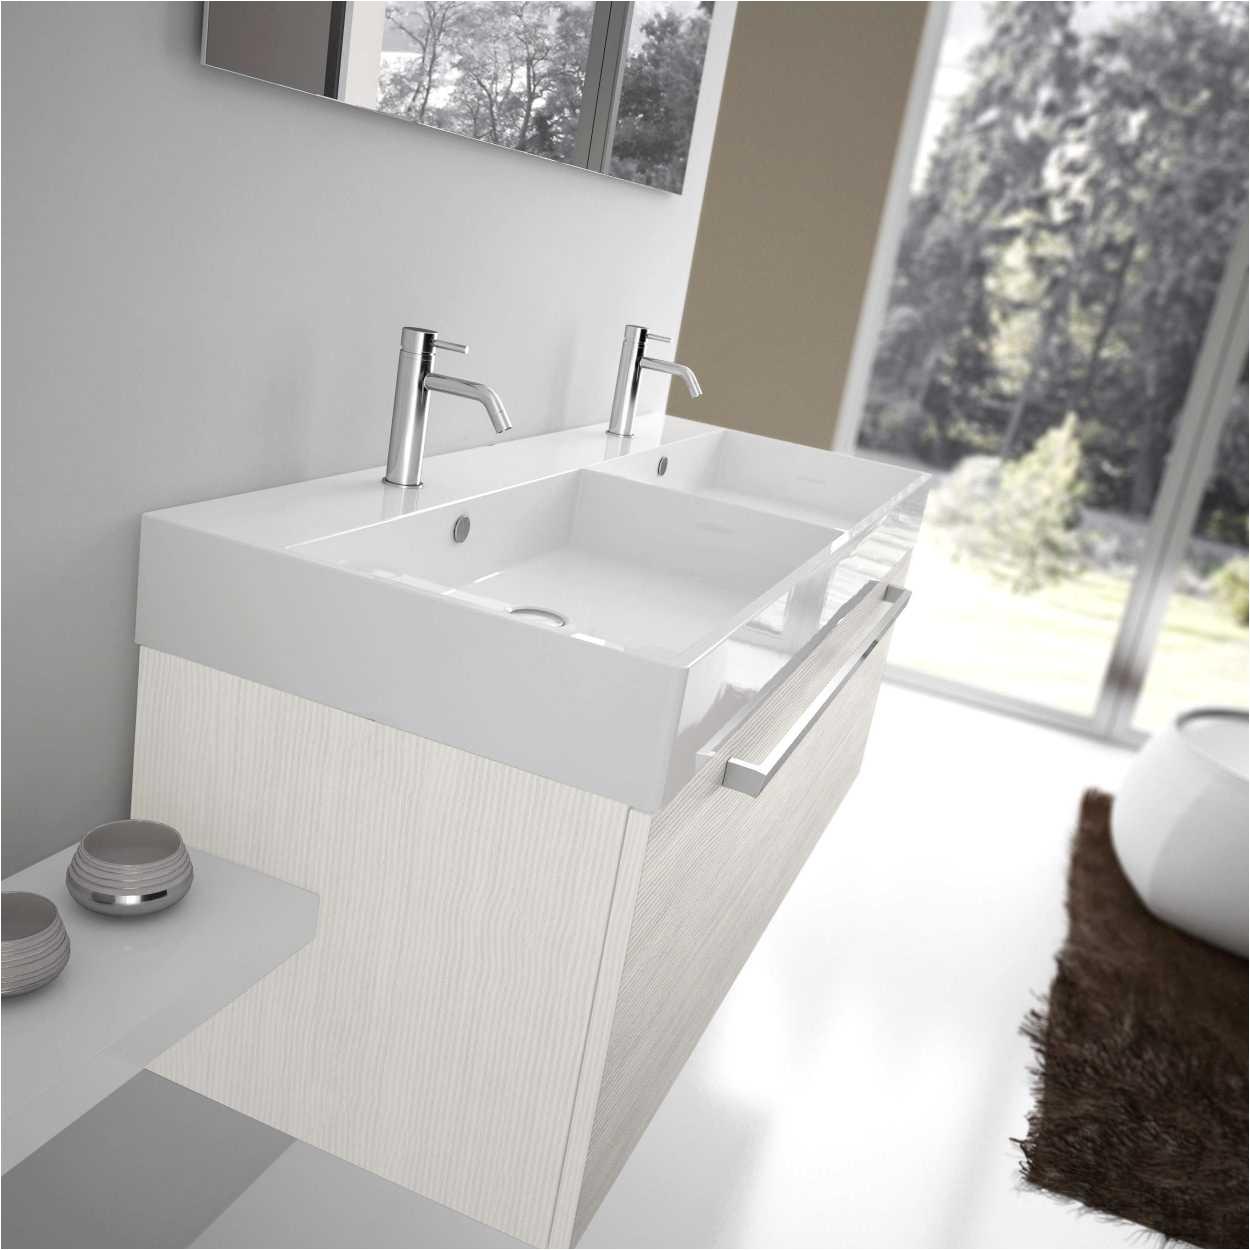 45 unique vintage bath sink